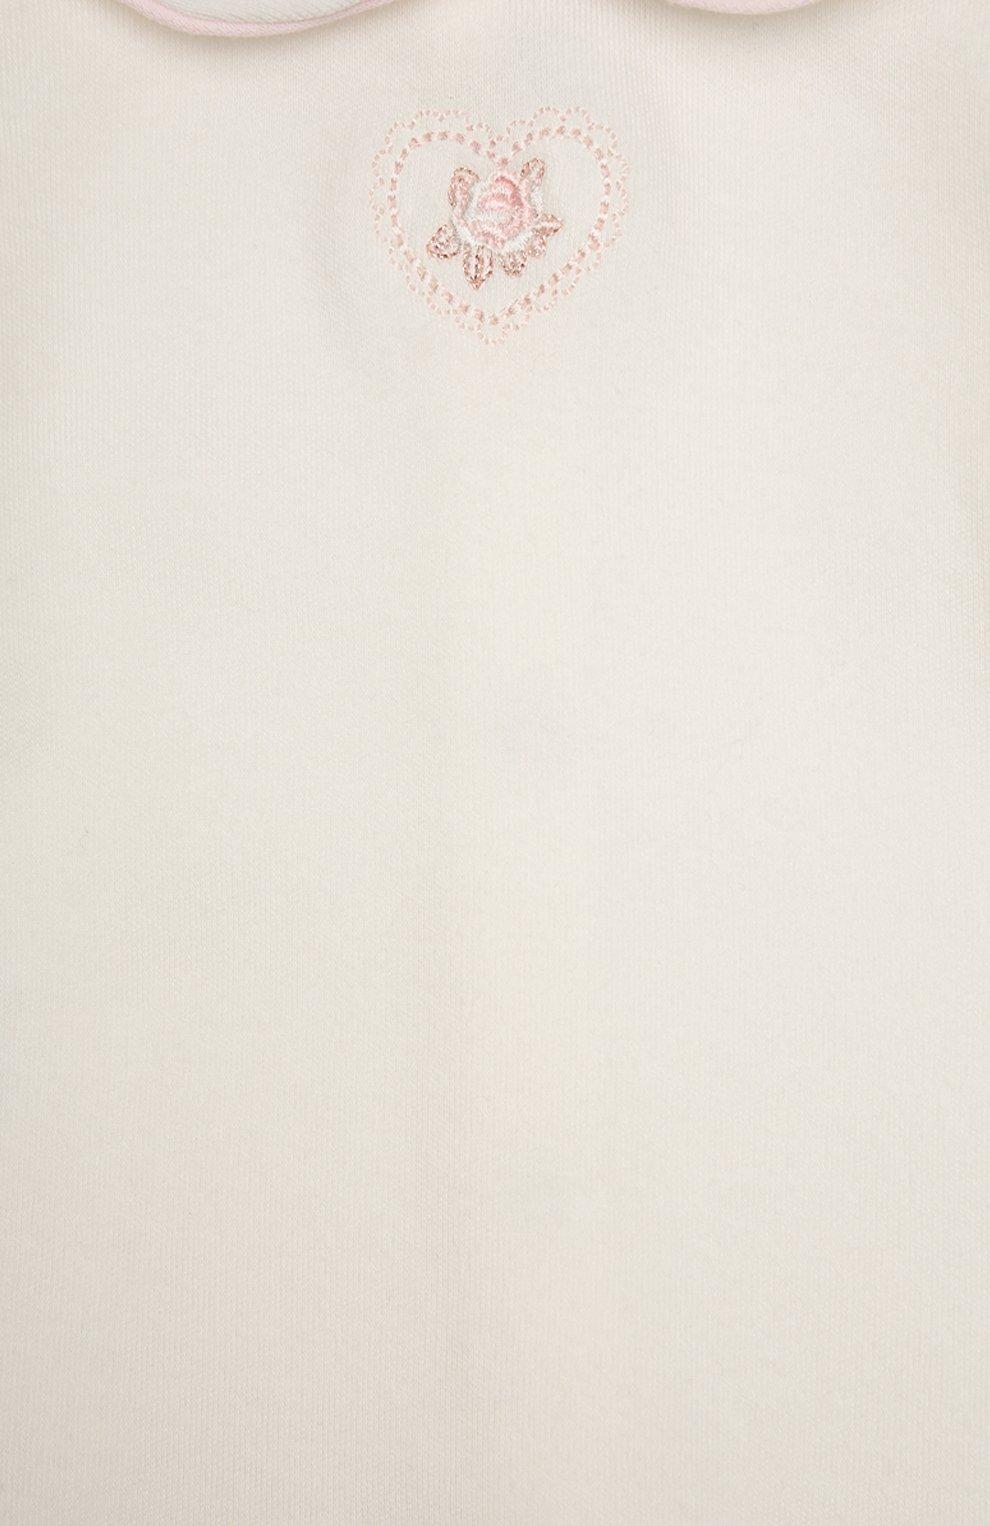 Детский костюм спортивный с футболкой  ALETTA розового цвета, арт. RP666112CIN/1M-18M | Фото 6